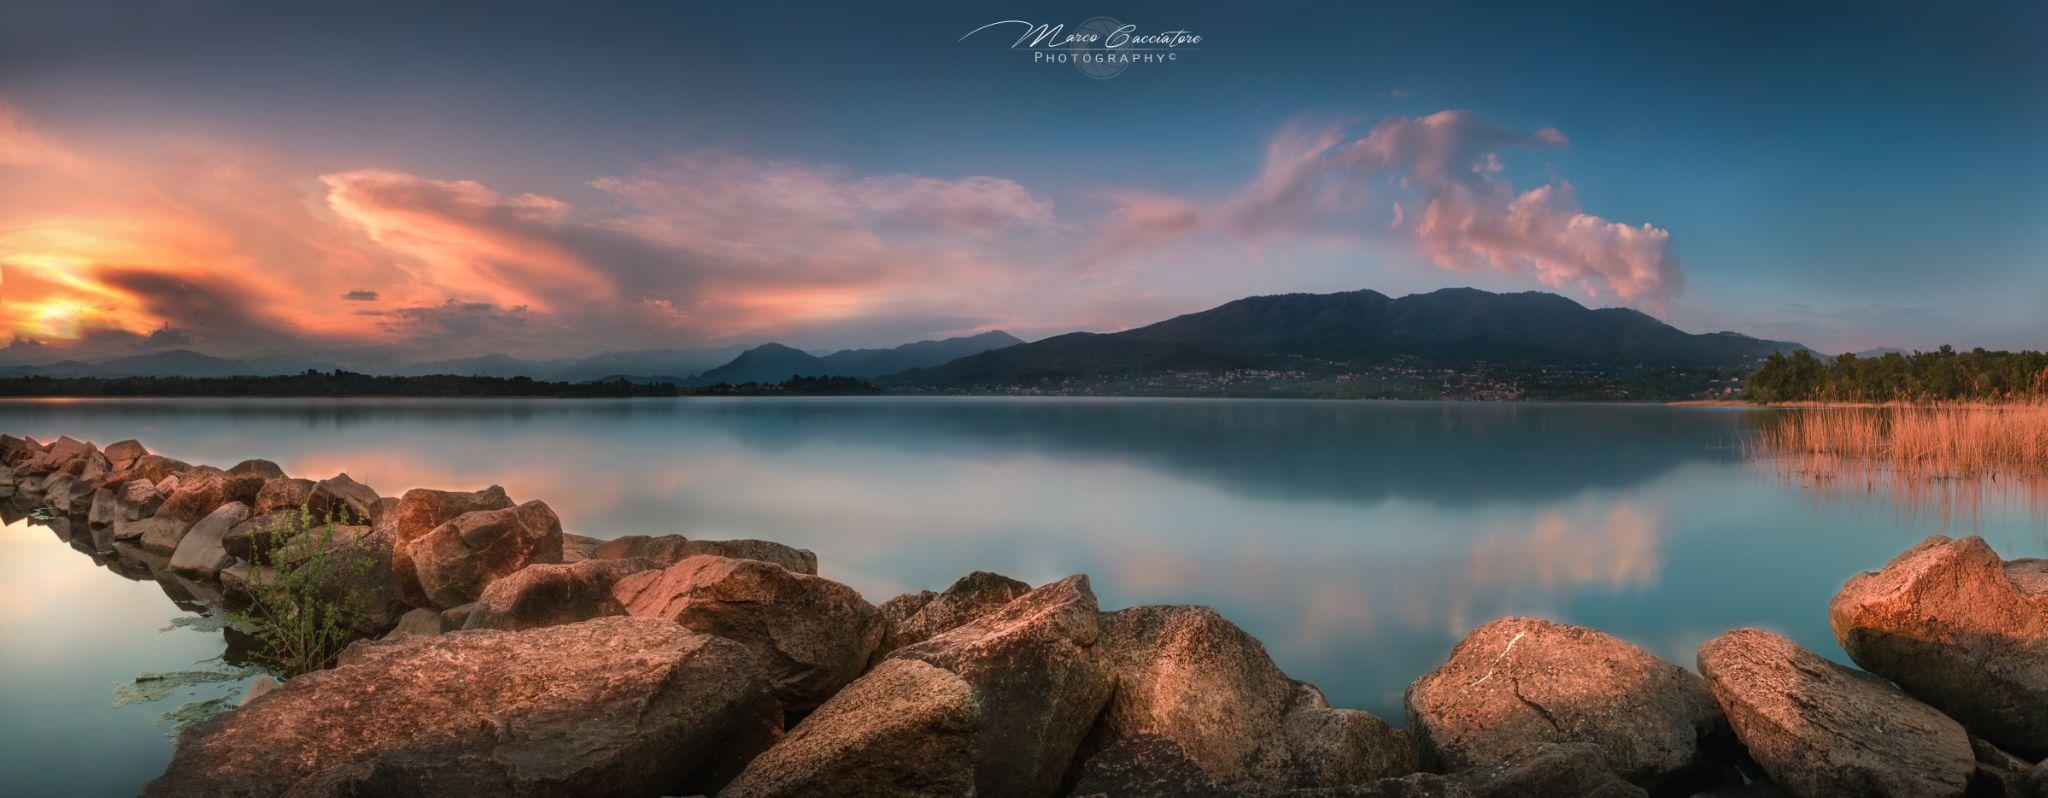 Lago Varese by marco.cacciatore1